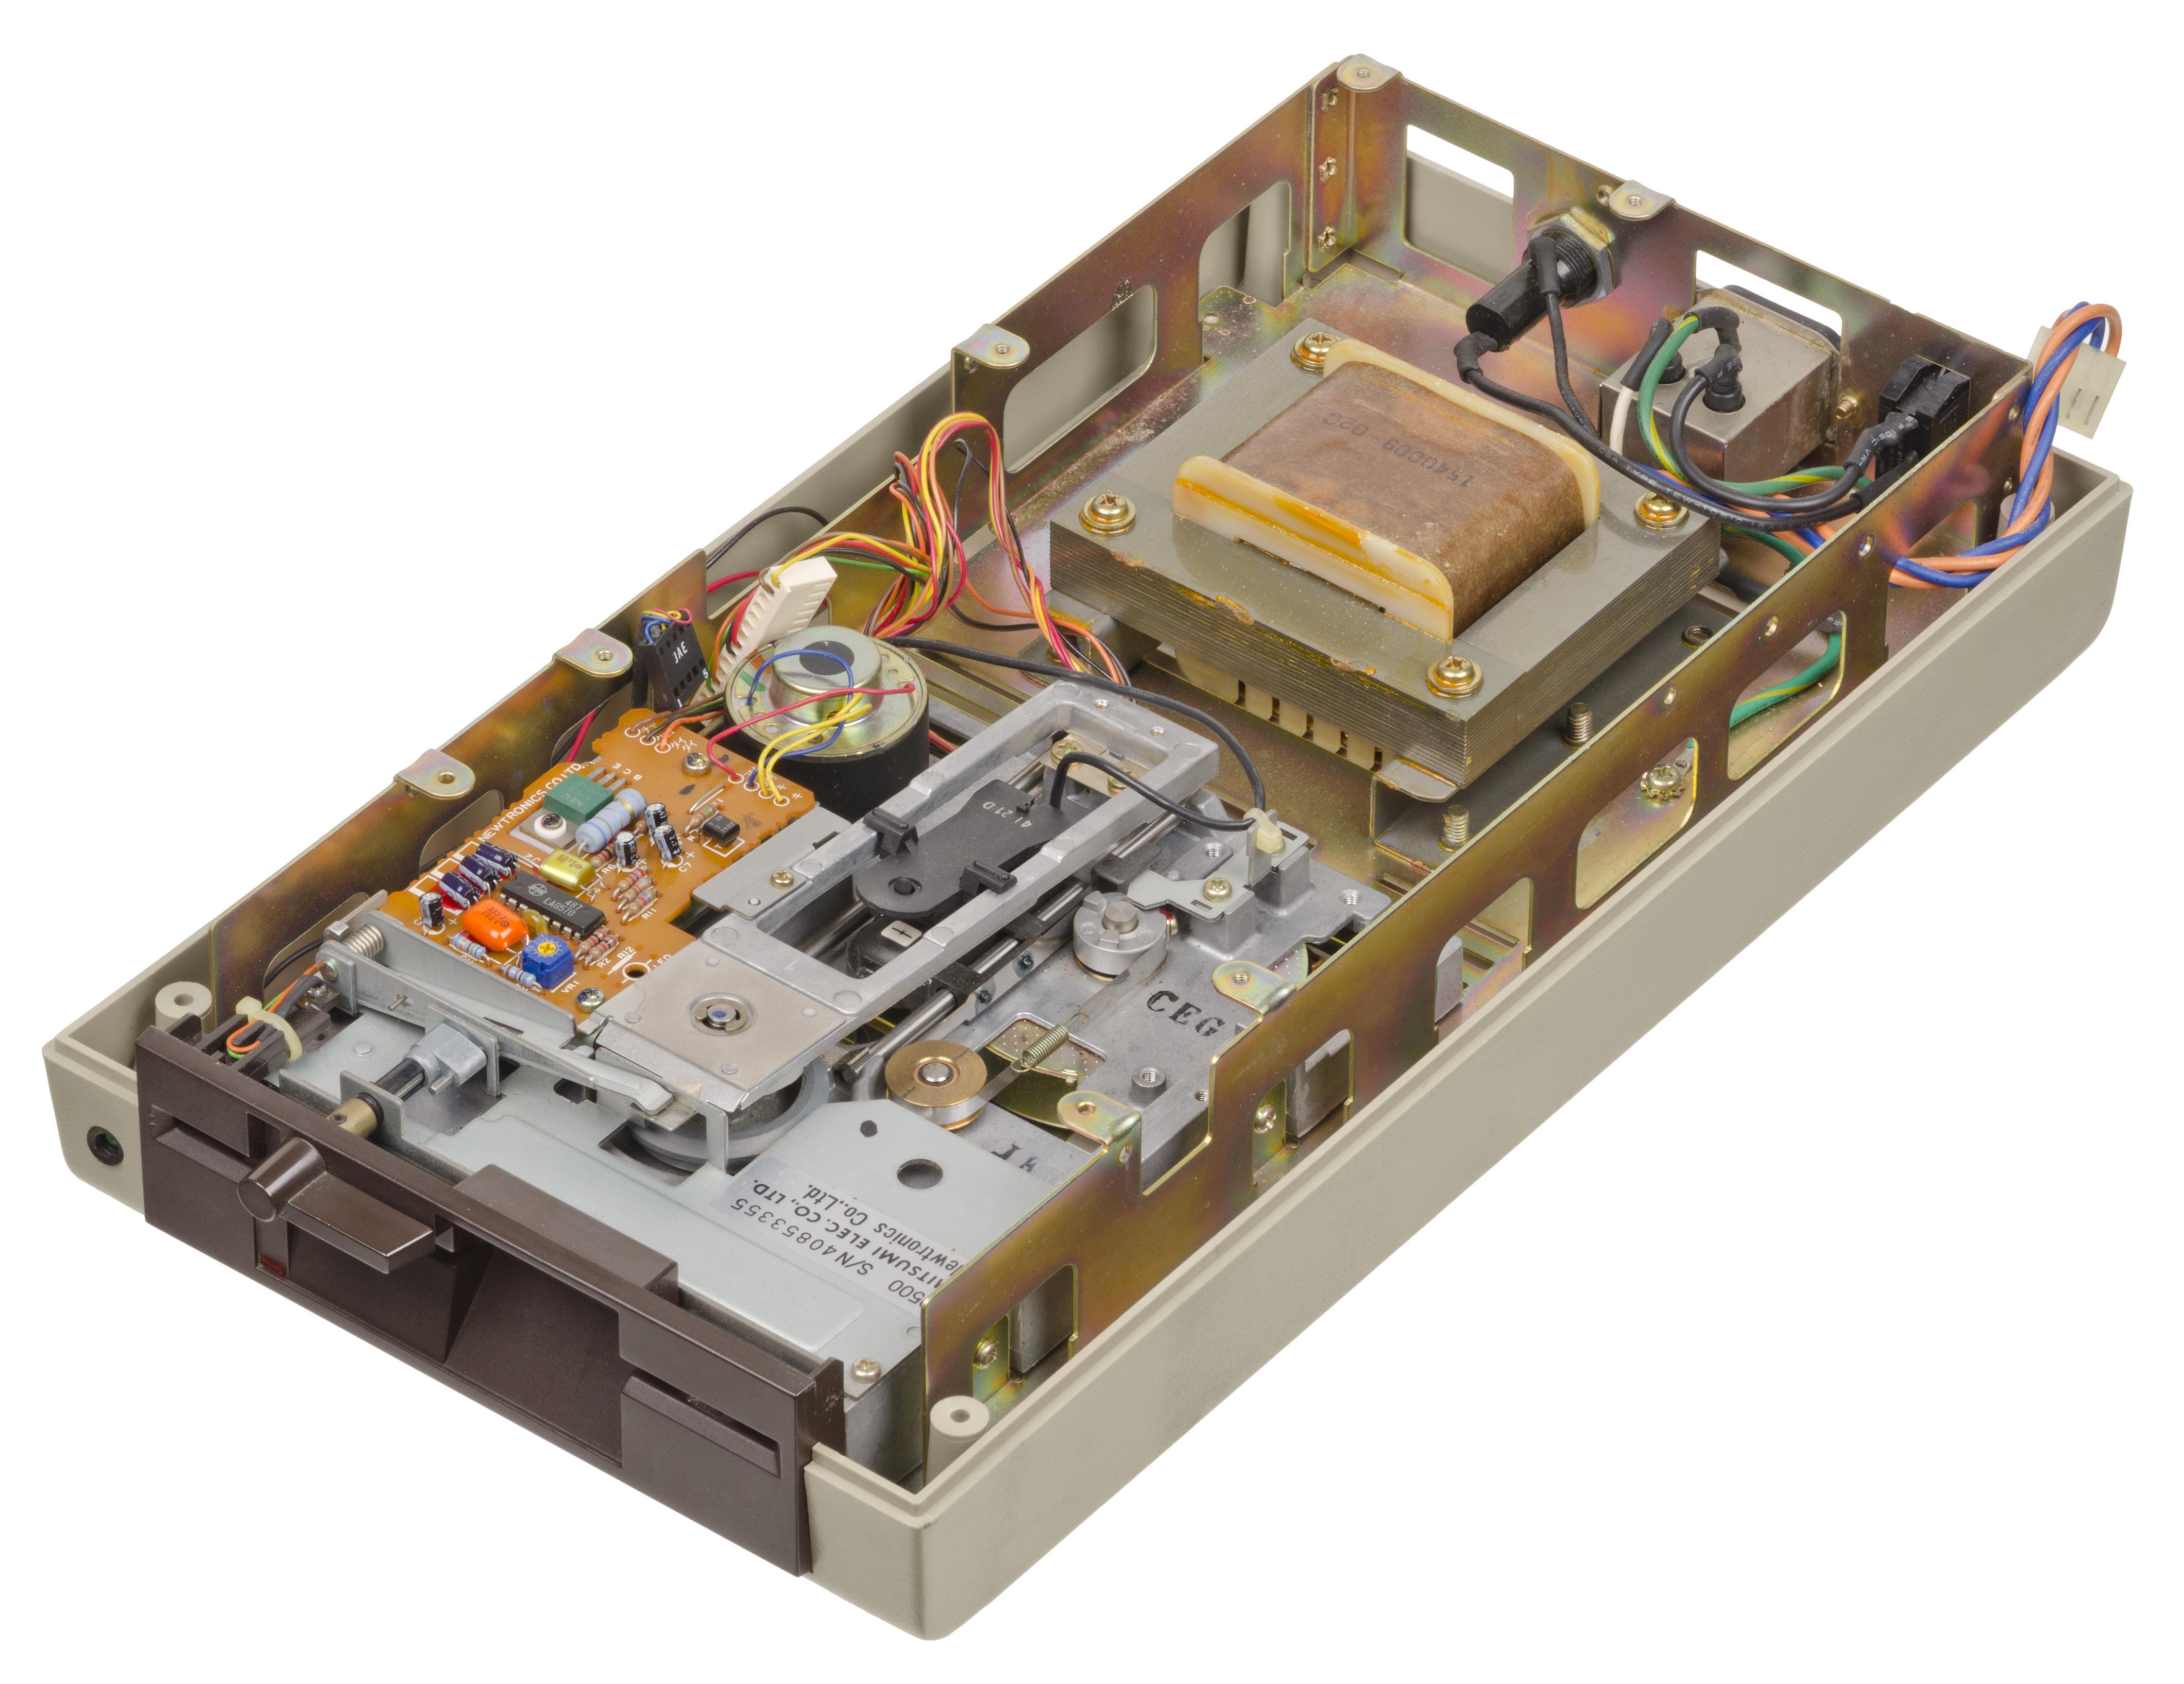 File:Commodore-64-1541-Floppy-Drive-07 jpg - Wikimedia Commons